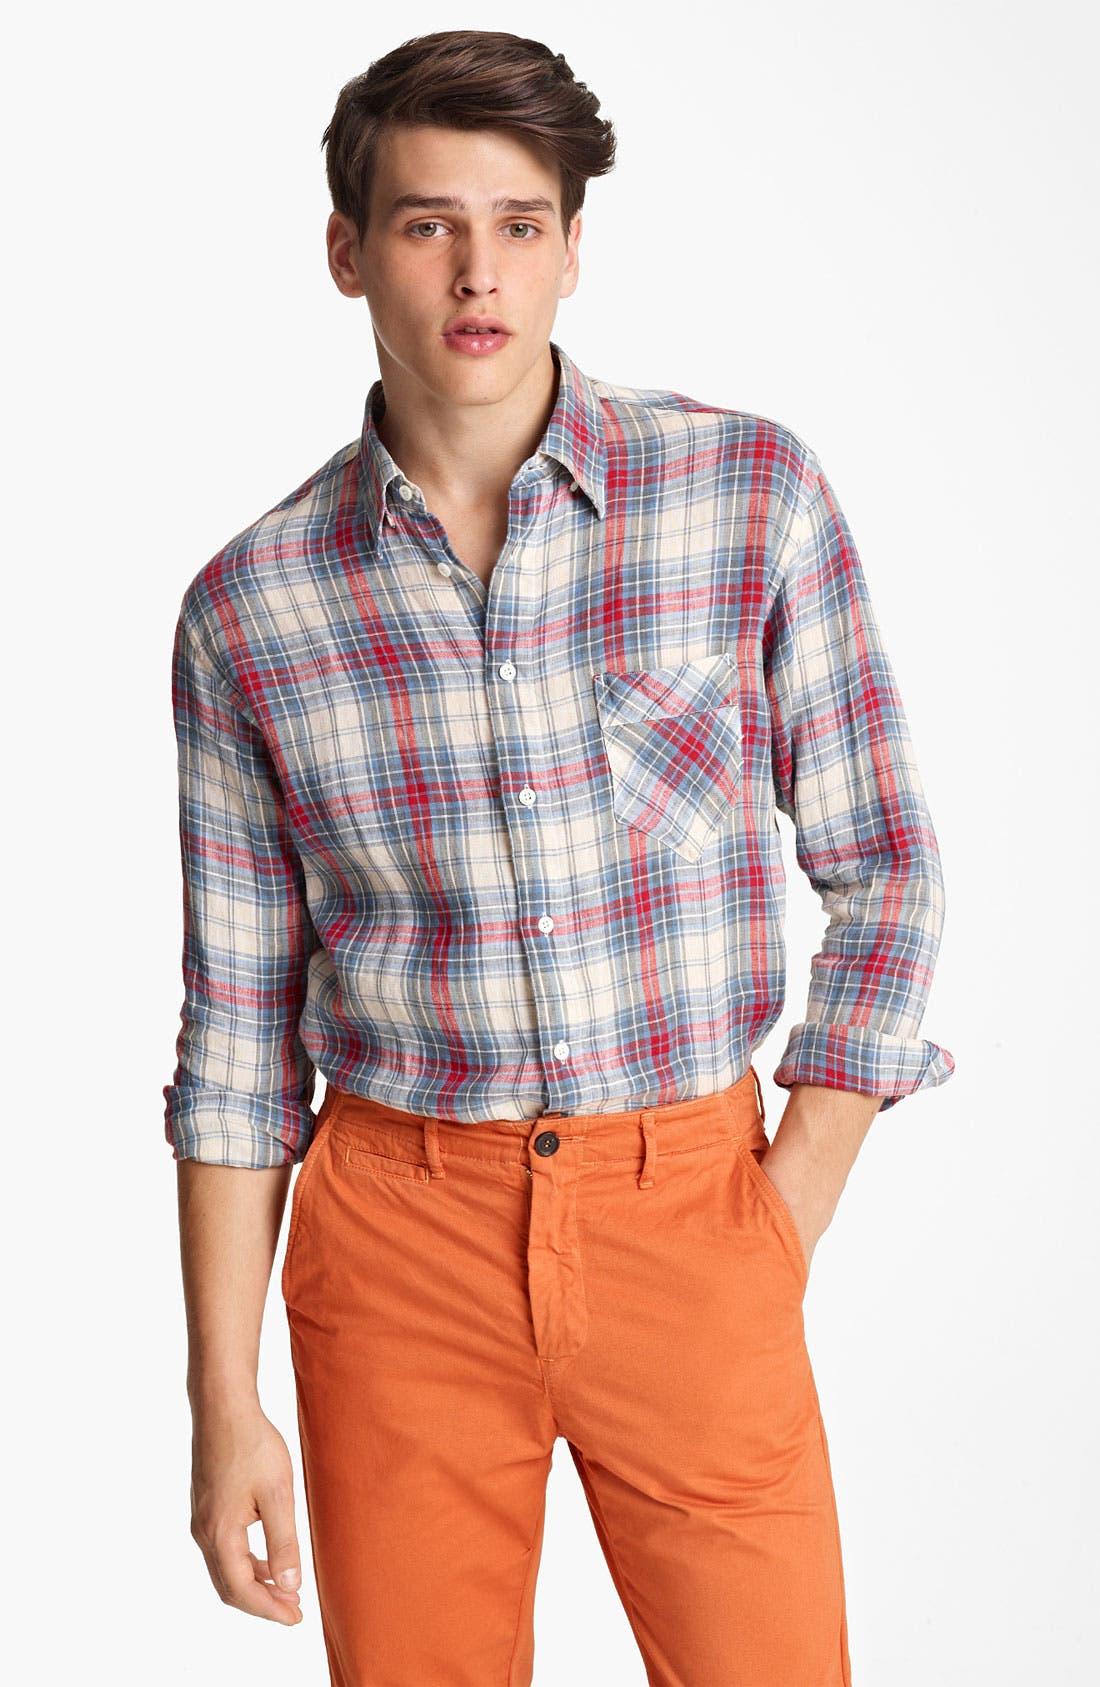 Alternate Image 1 Selected - Billy Reid 'Walland' Plaid Linen Shirt